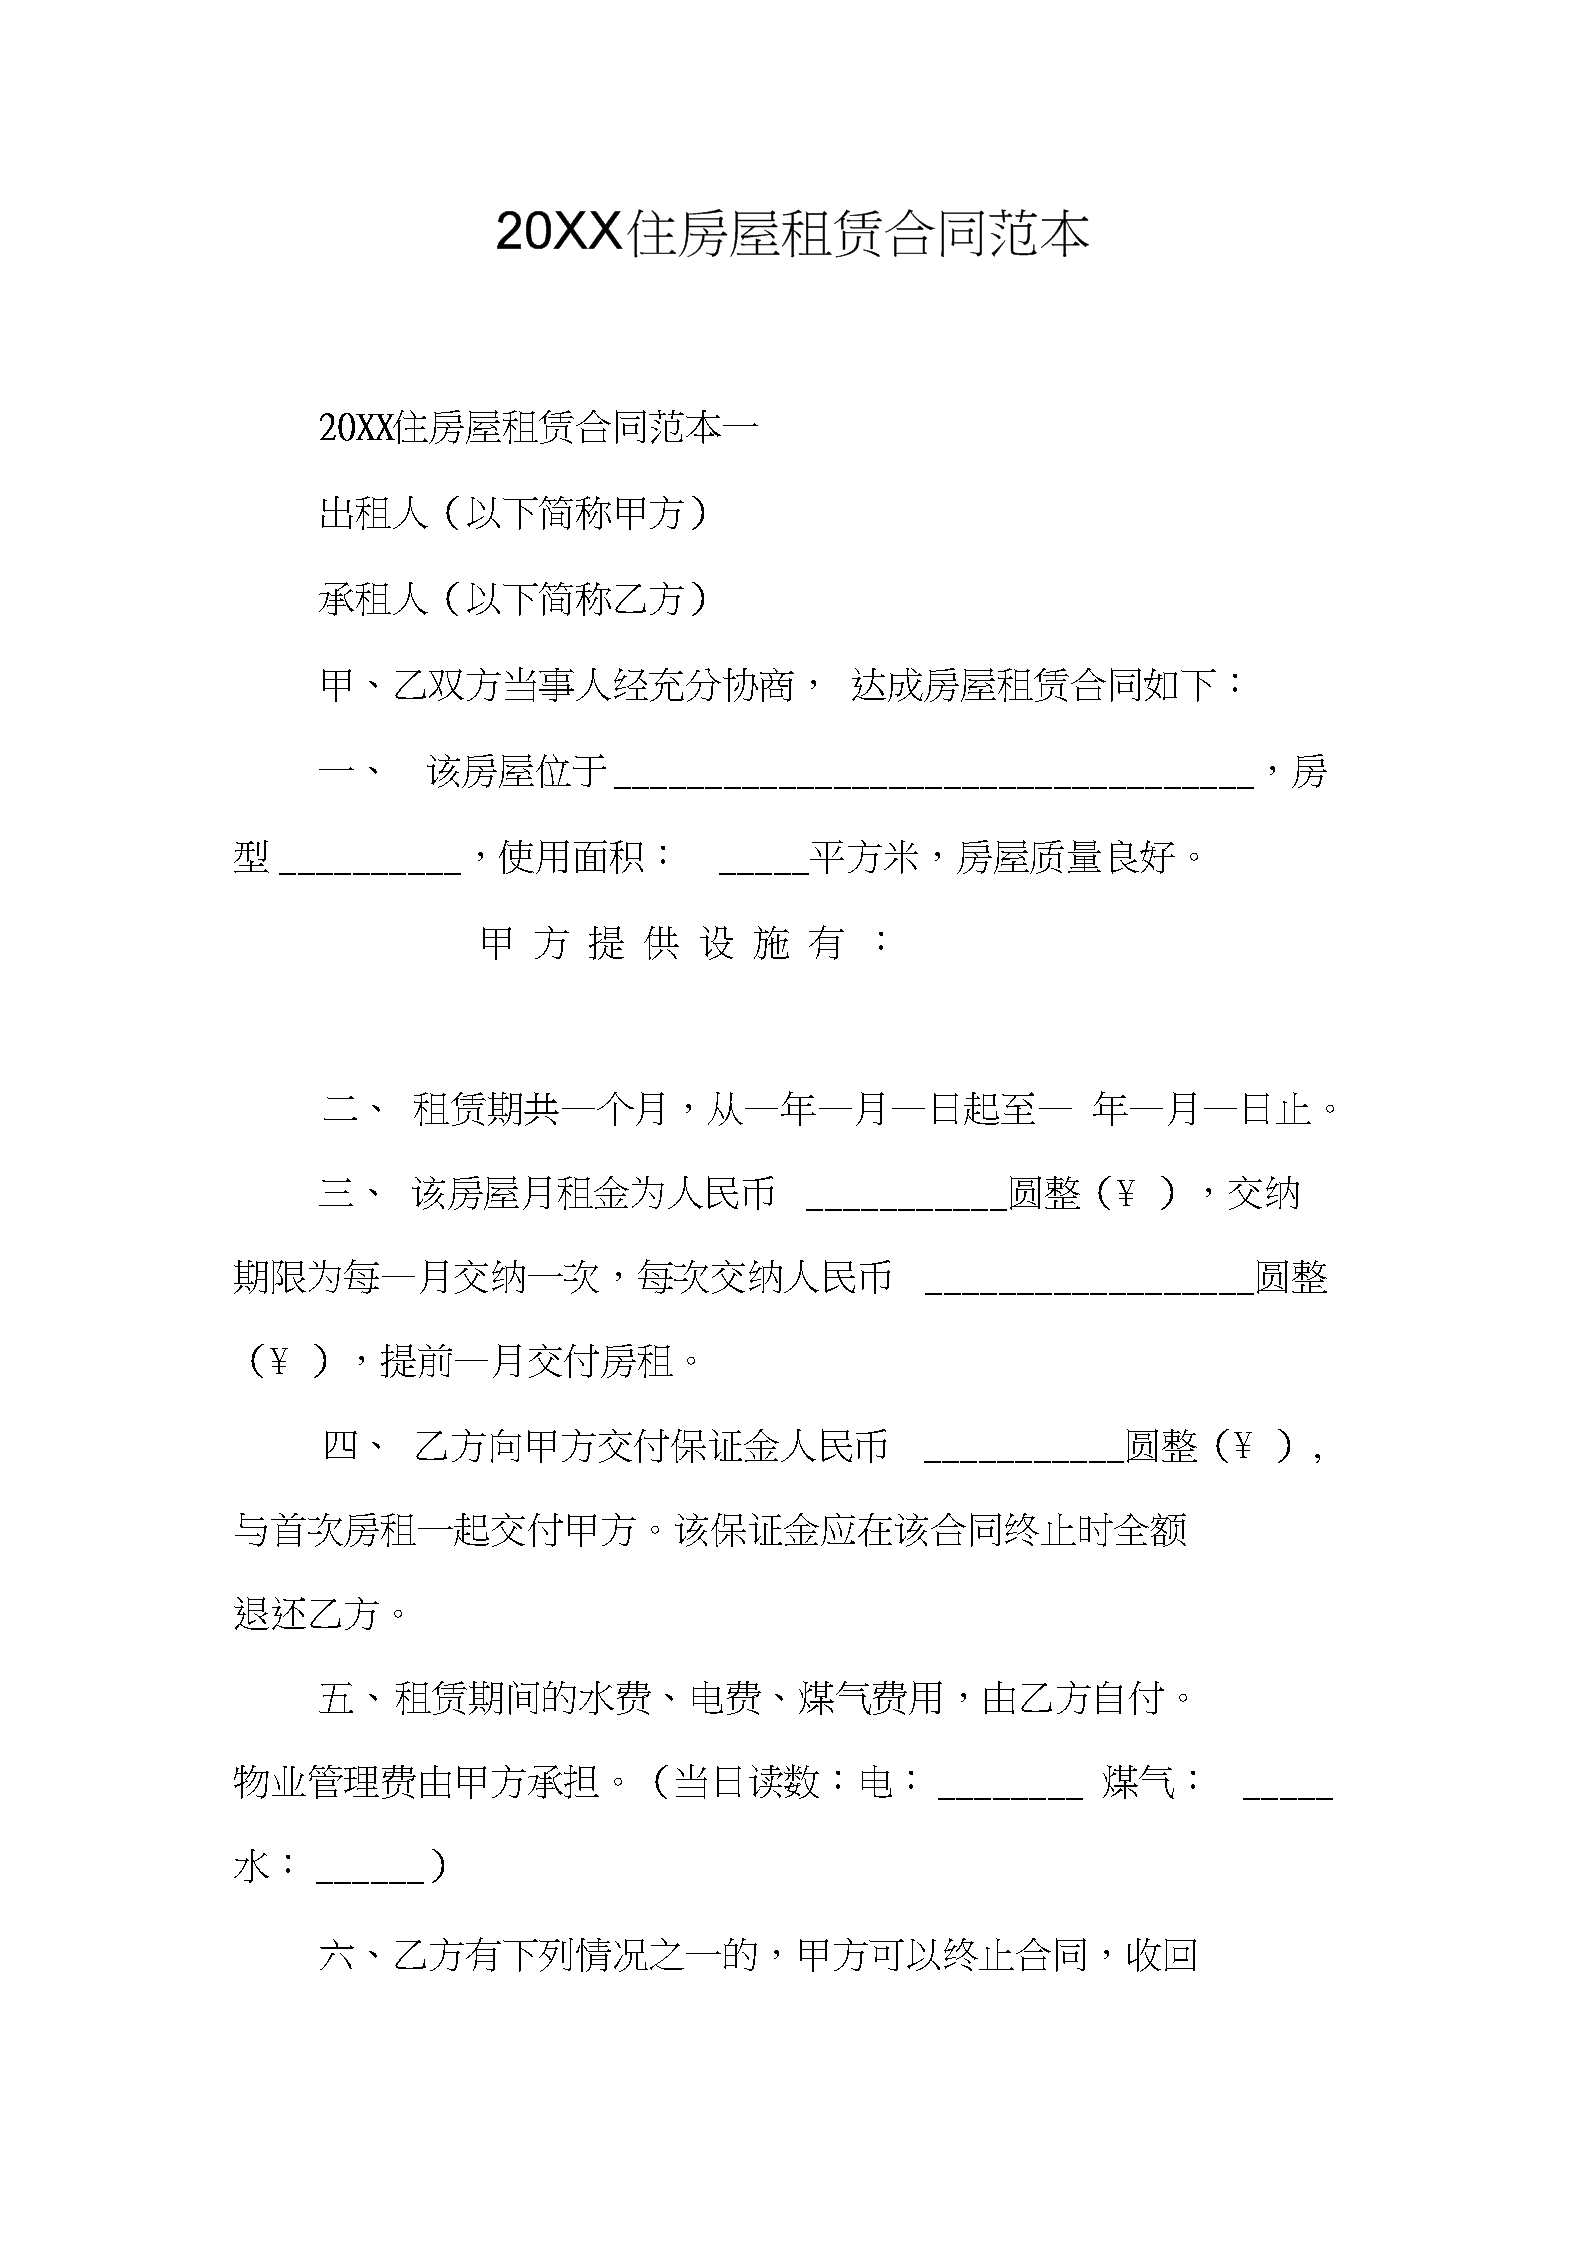 20XX住房屋租赁合同范本.docx